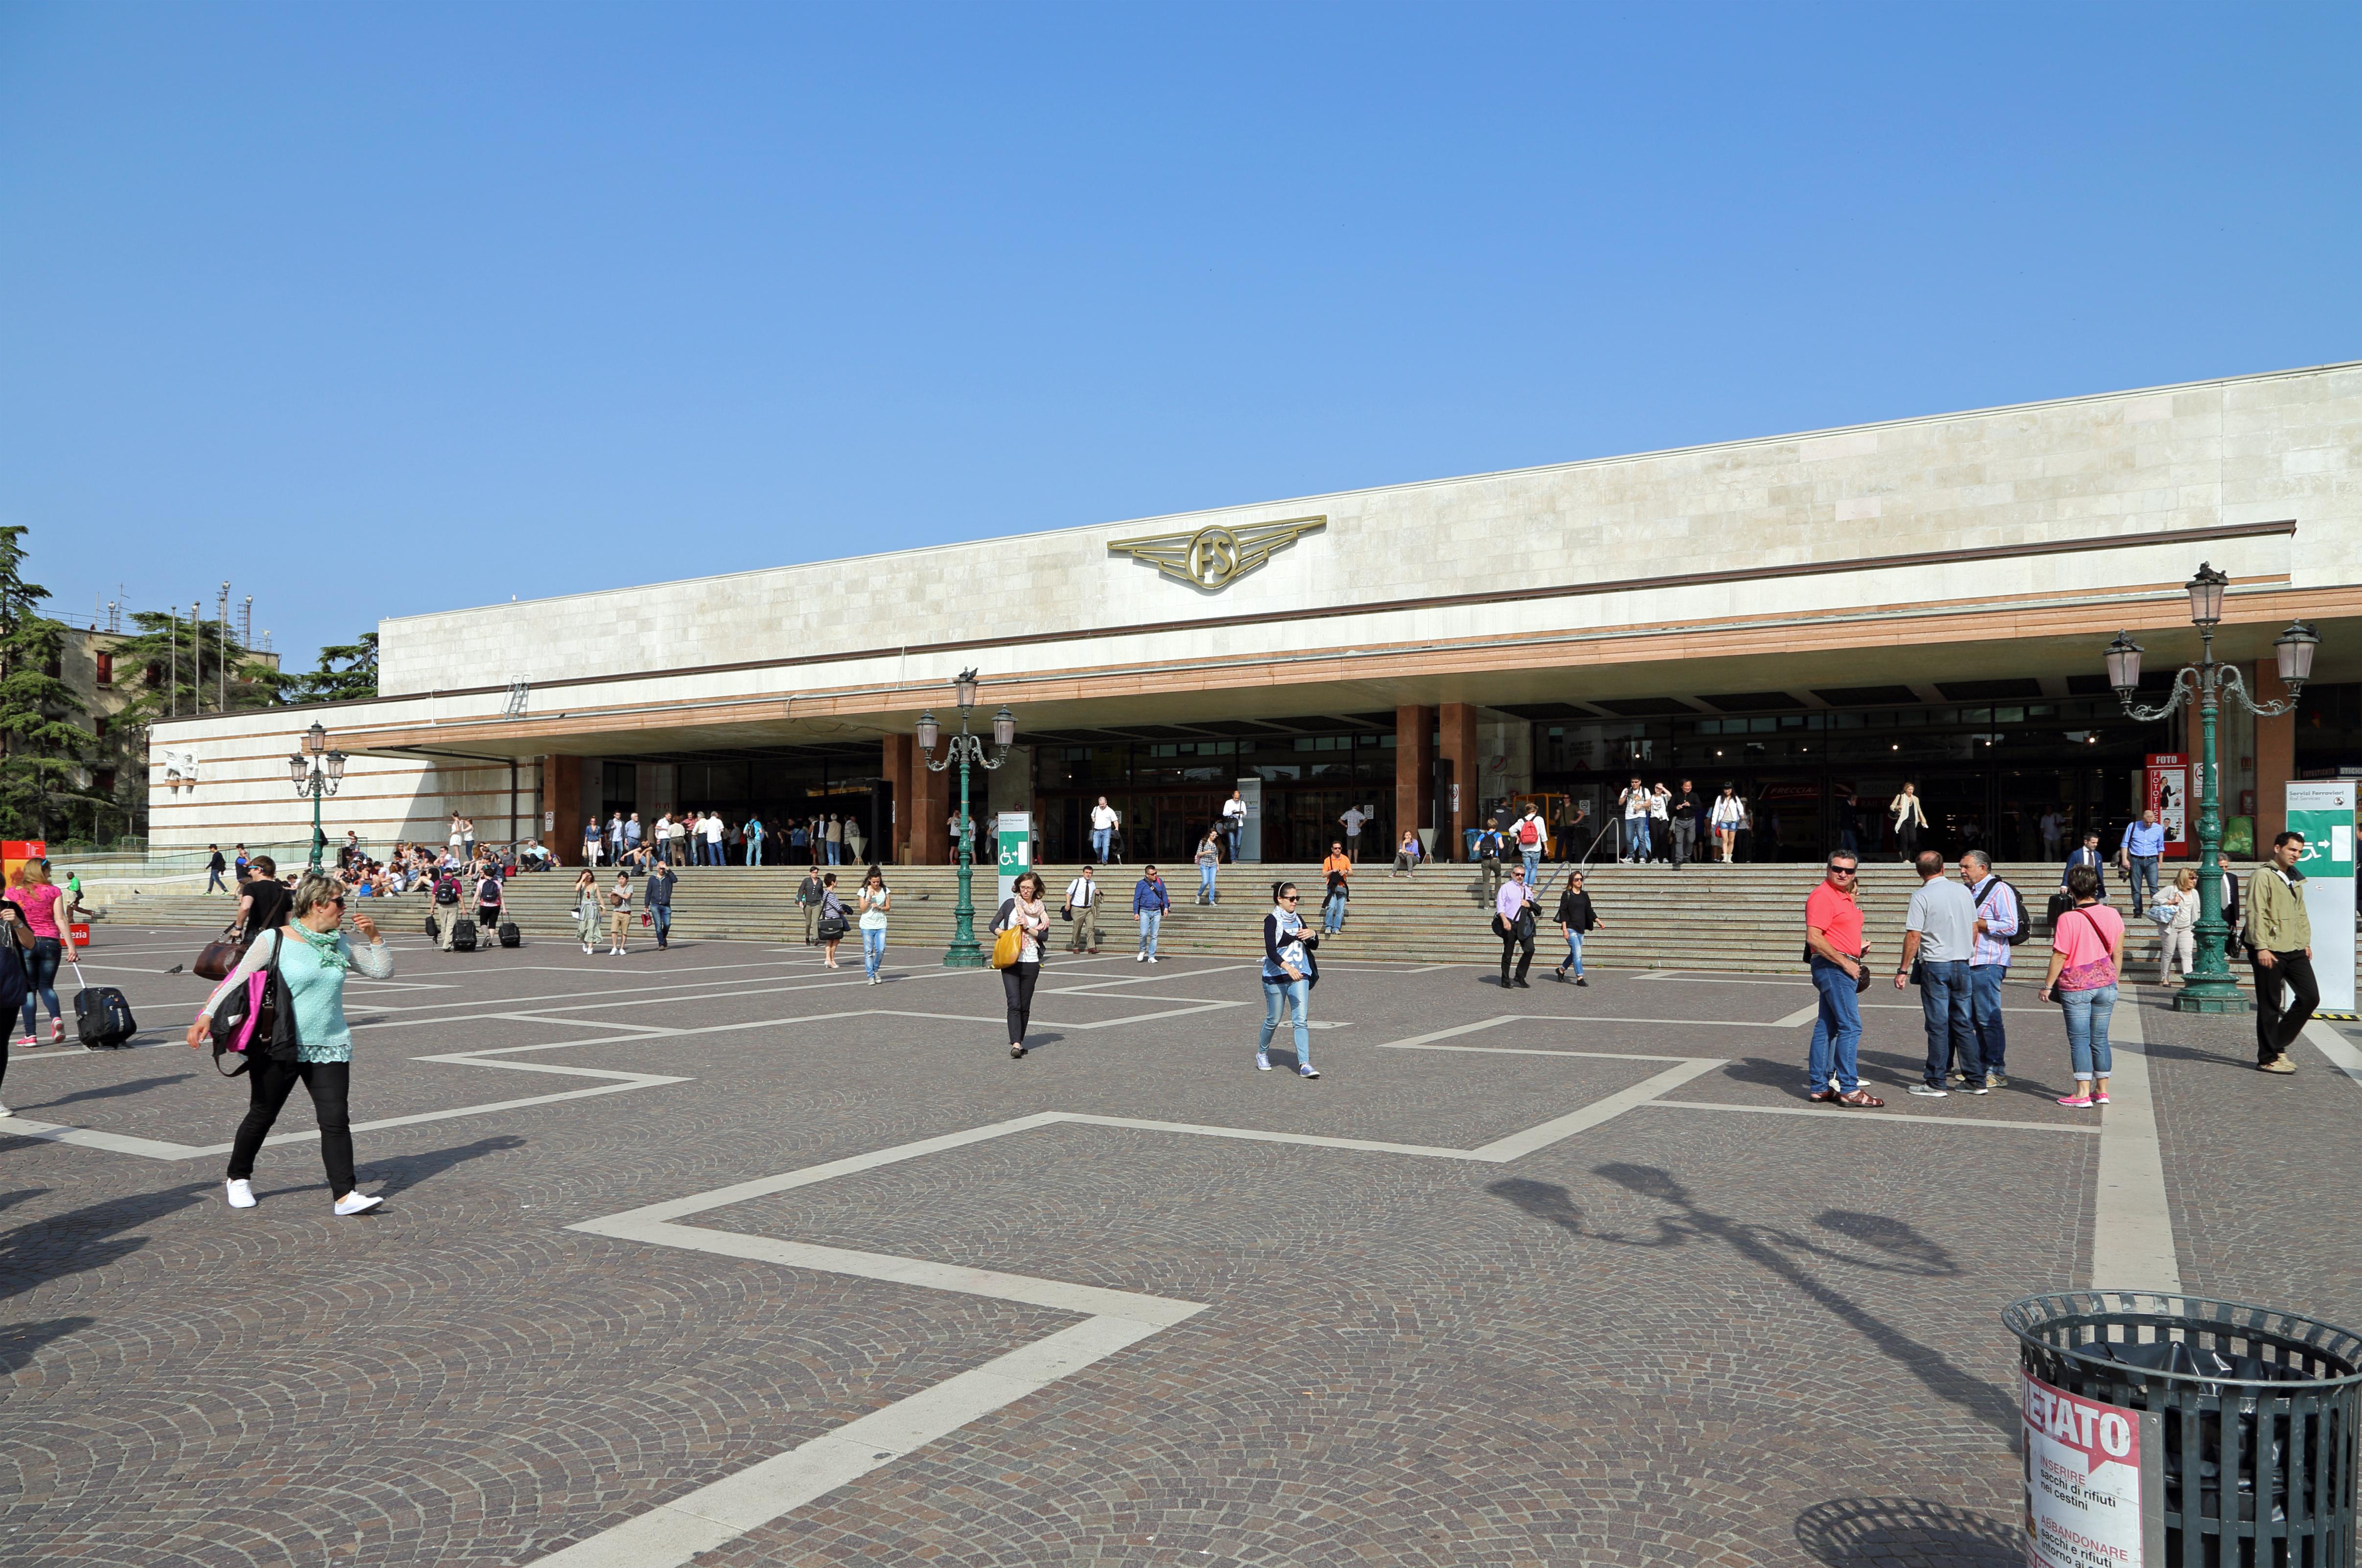 j k railway stations in venice - photo#24